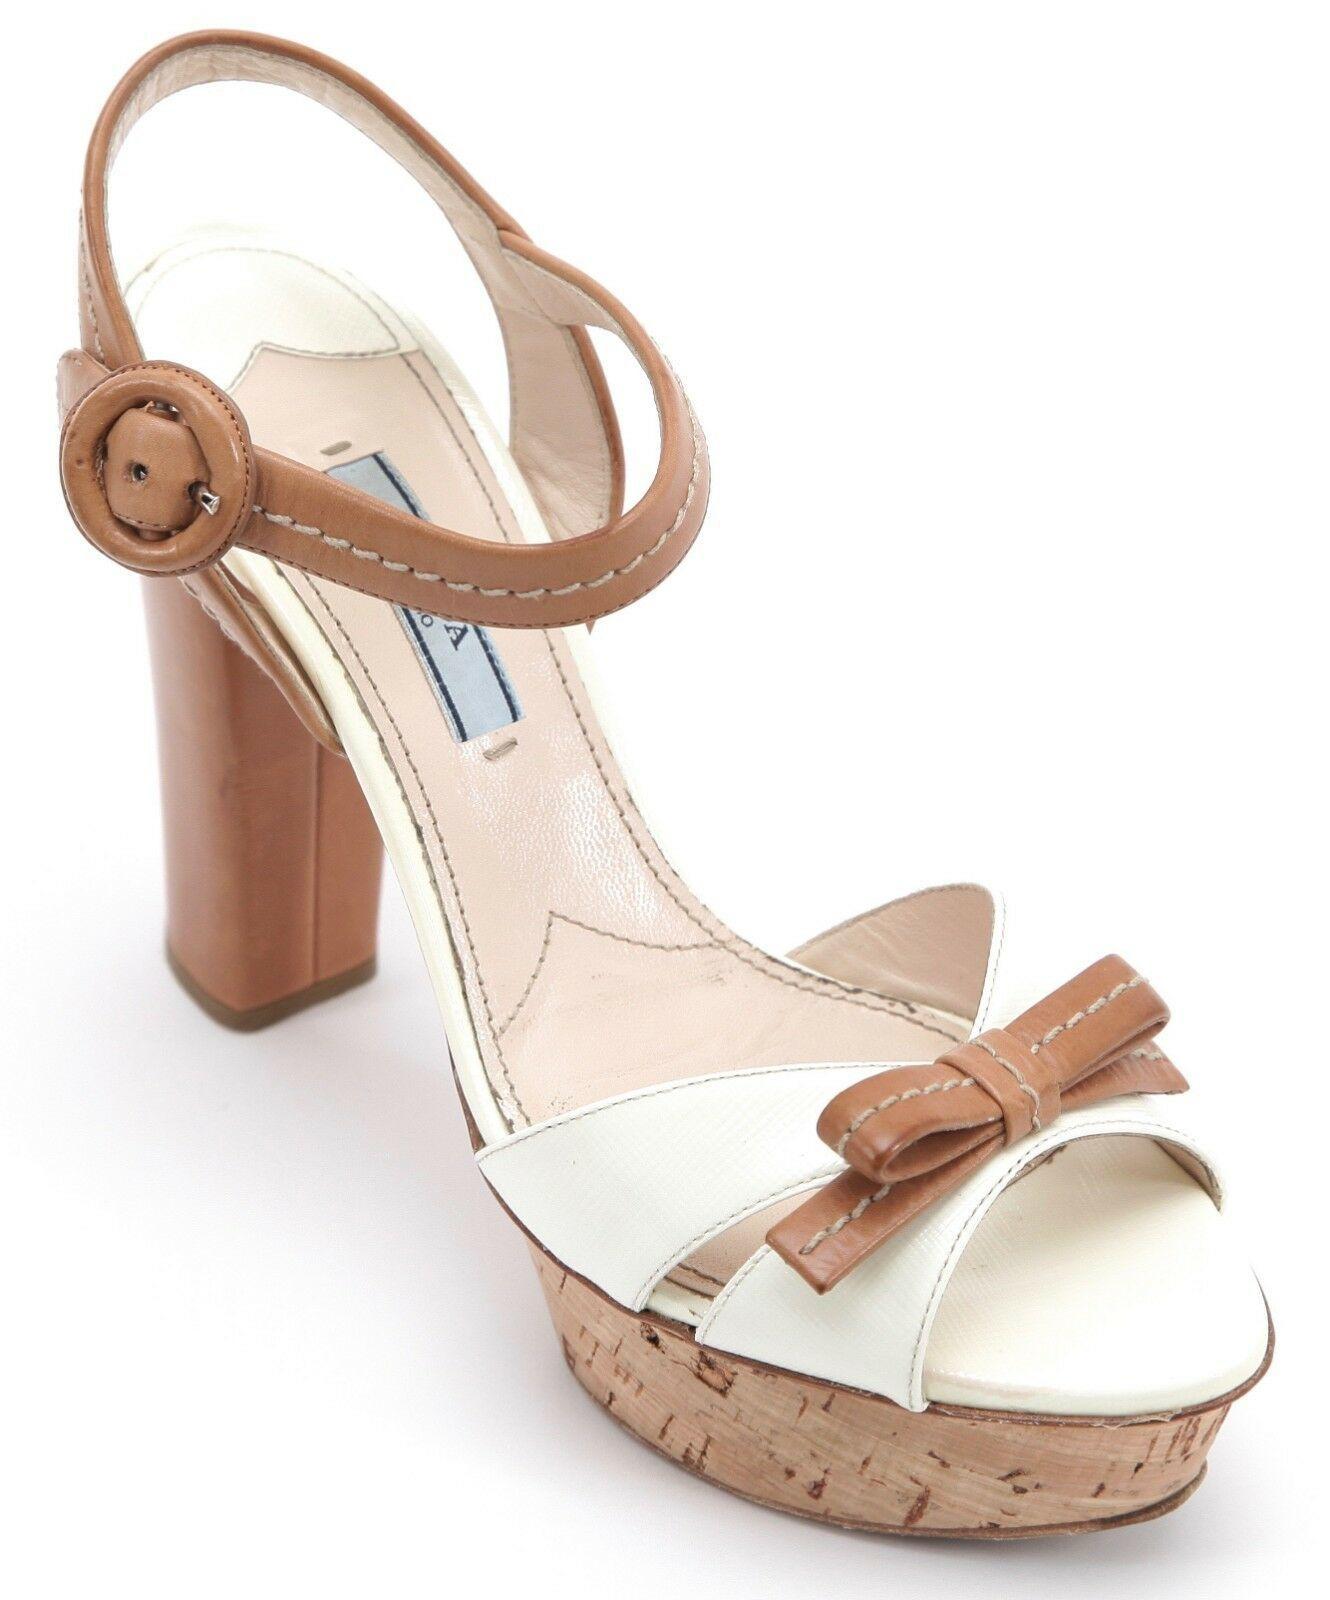 75b6f14460 PRADA Platform Sandal White Saffiano Leather Natural Cork Peep Toe Sz 37.5  - $218.50